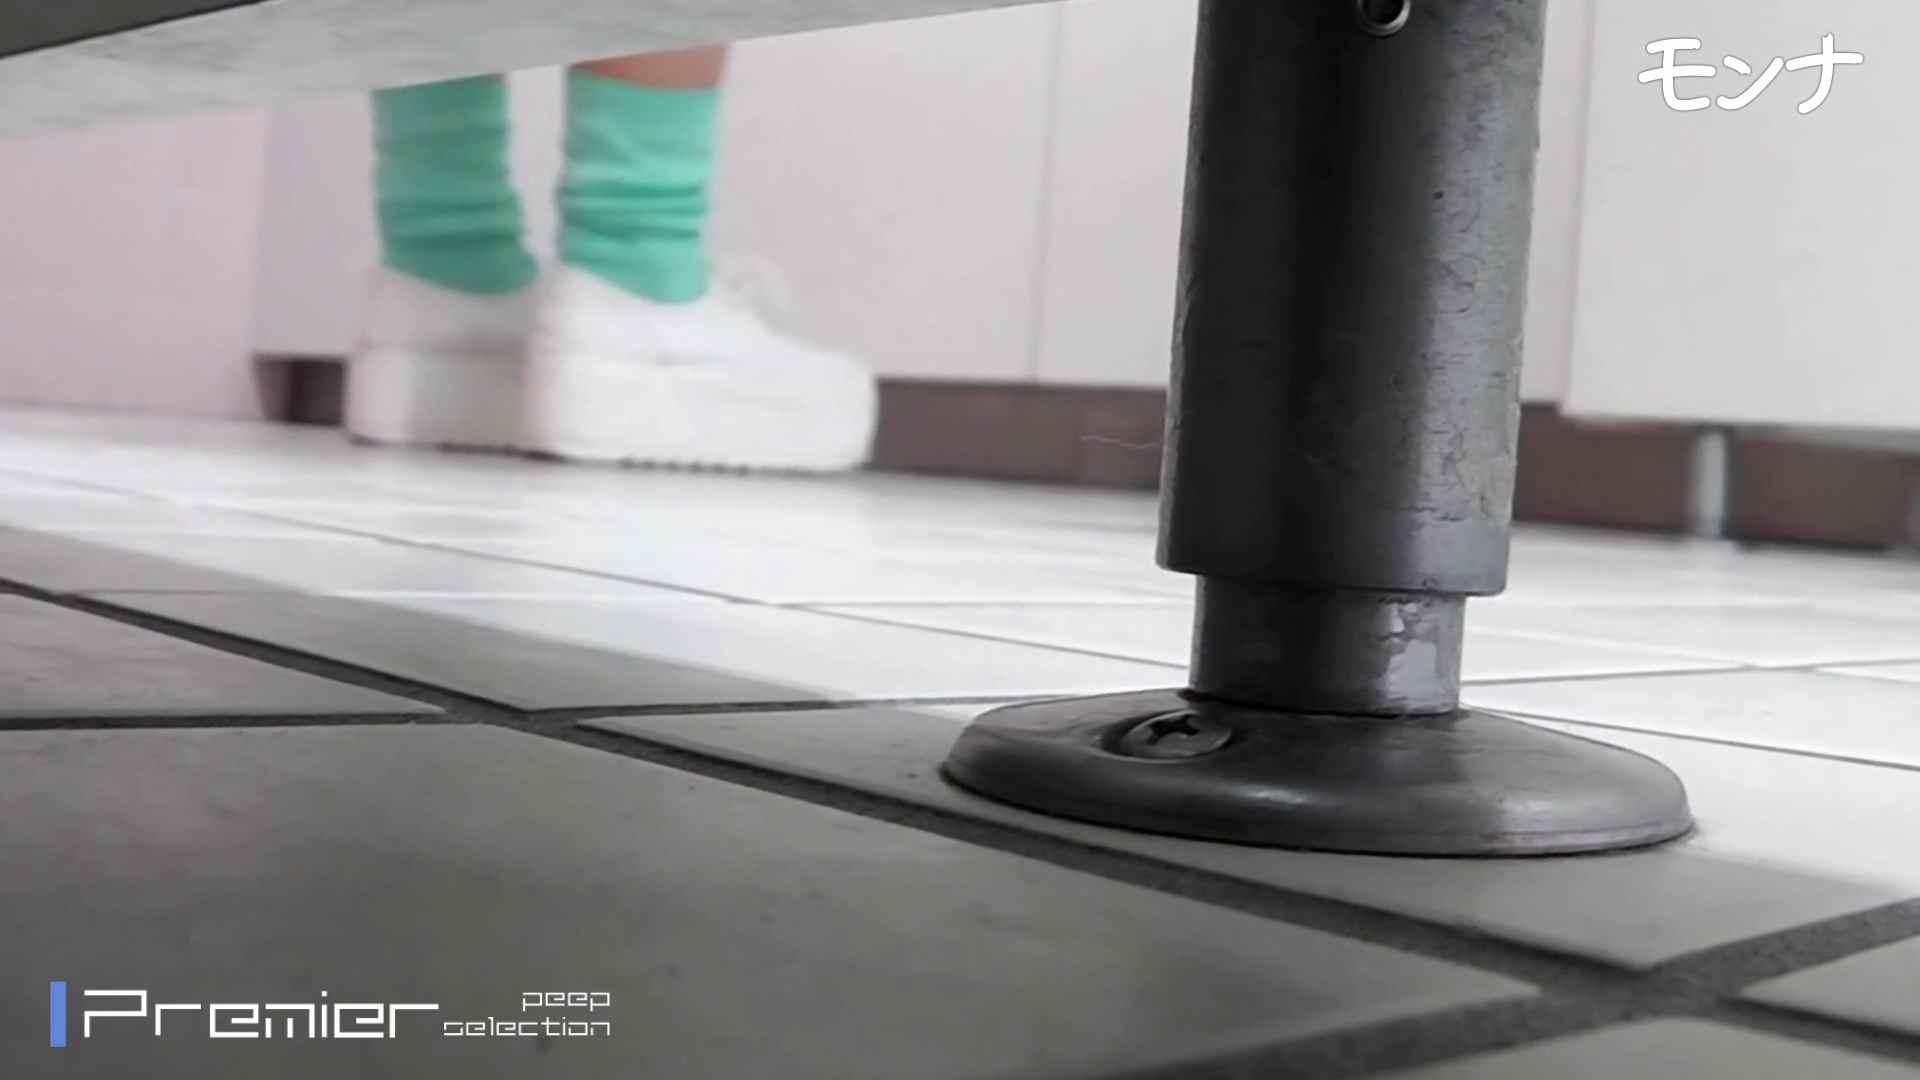 CM 悶絶シリーズ5 【美しい日本の未来 No.128】 ギャル達 AV動画キャプチャ 111枚 12